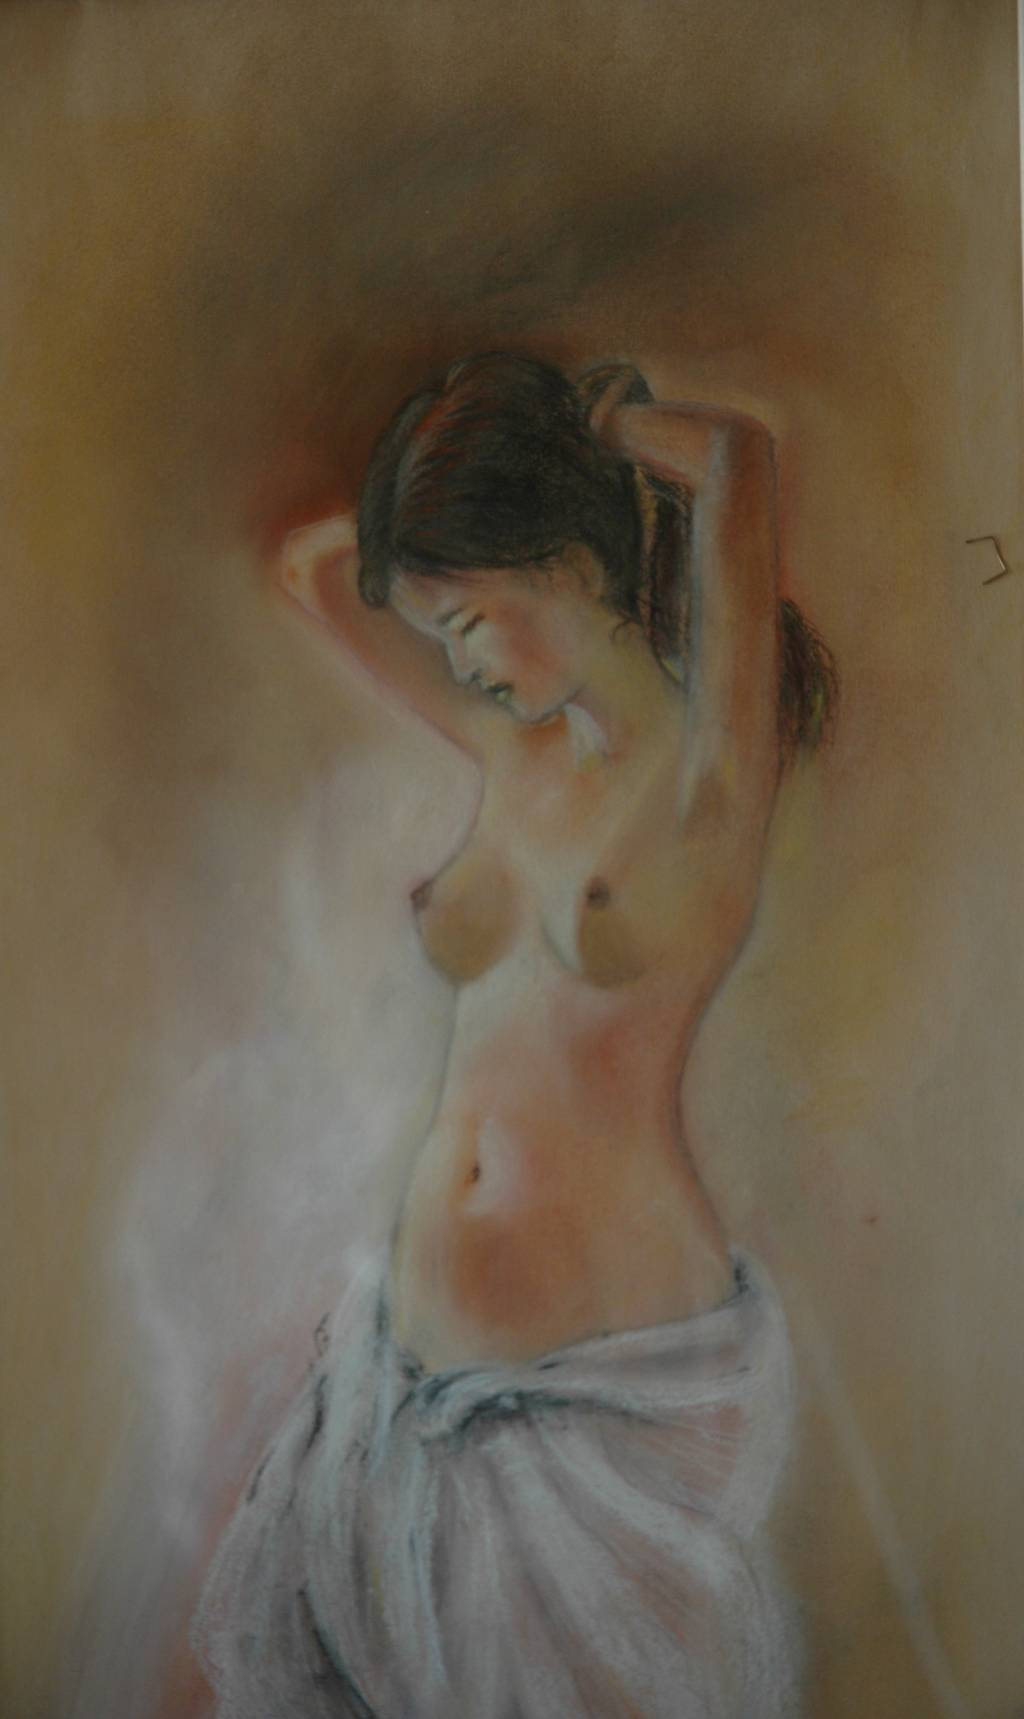 Joven desnuda sentada - Obra - ARTEHISTORIA V2